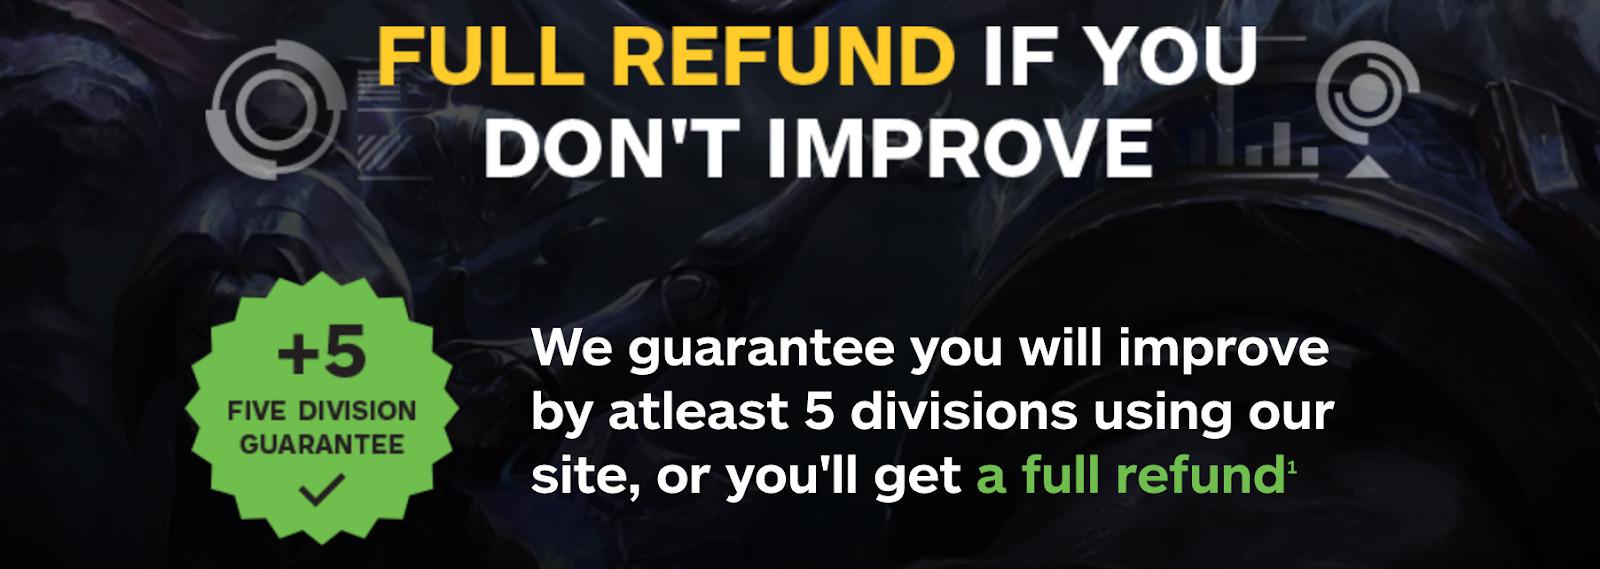 Skill Capped full refund guarantee